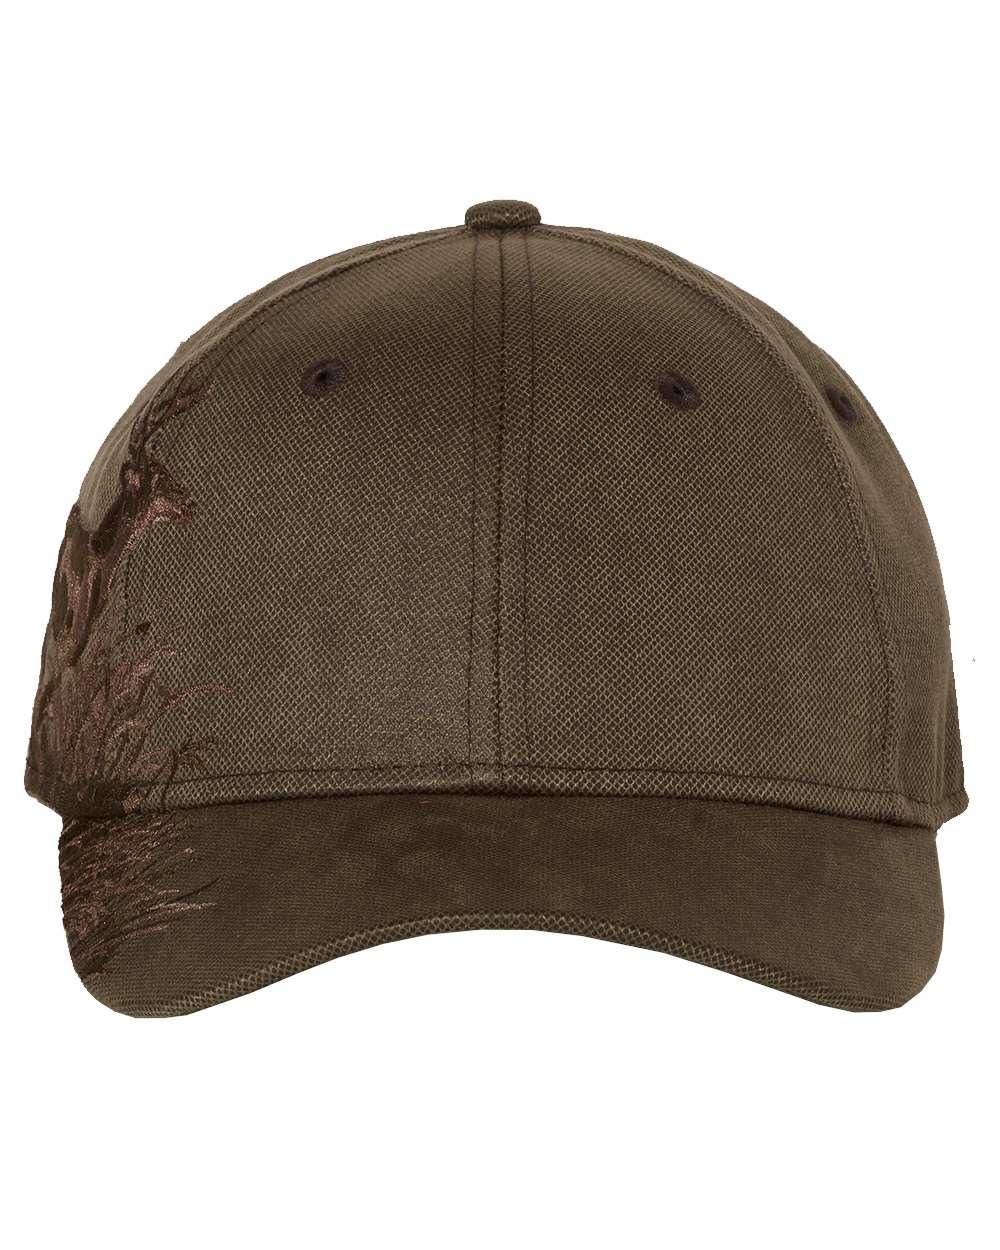 DRI DUCK - Running Buck Cap - 3301 - Brown Waxy Canvas - Adjustable - One Size